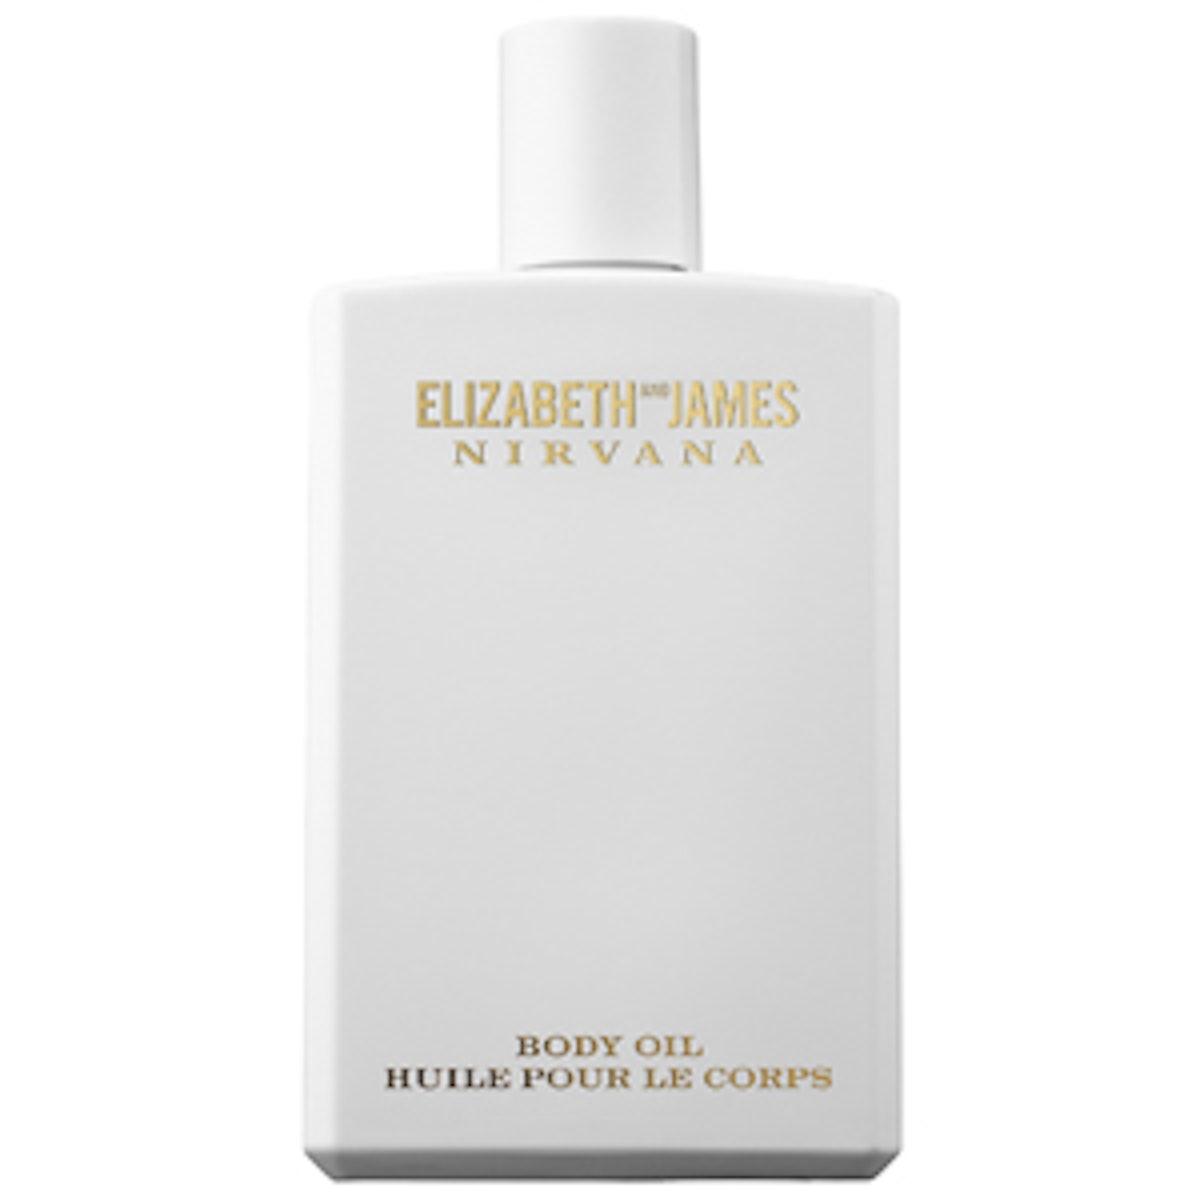 Nirvana White Body Oil